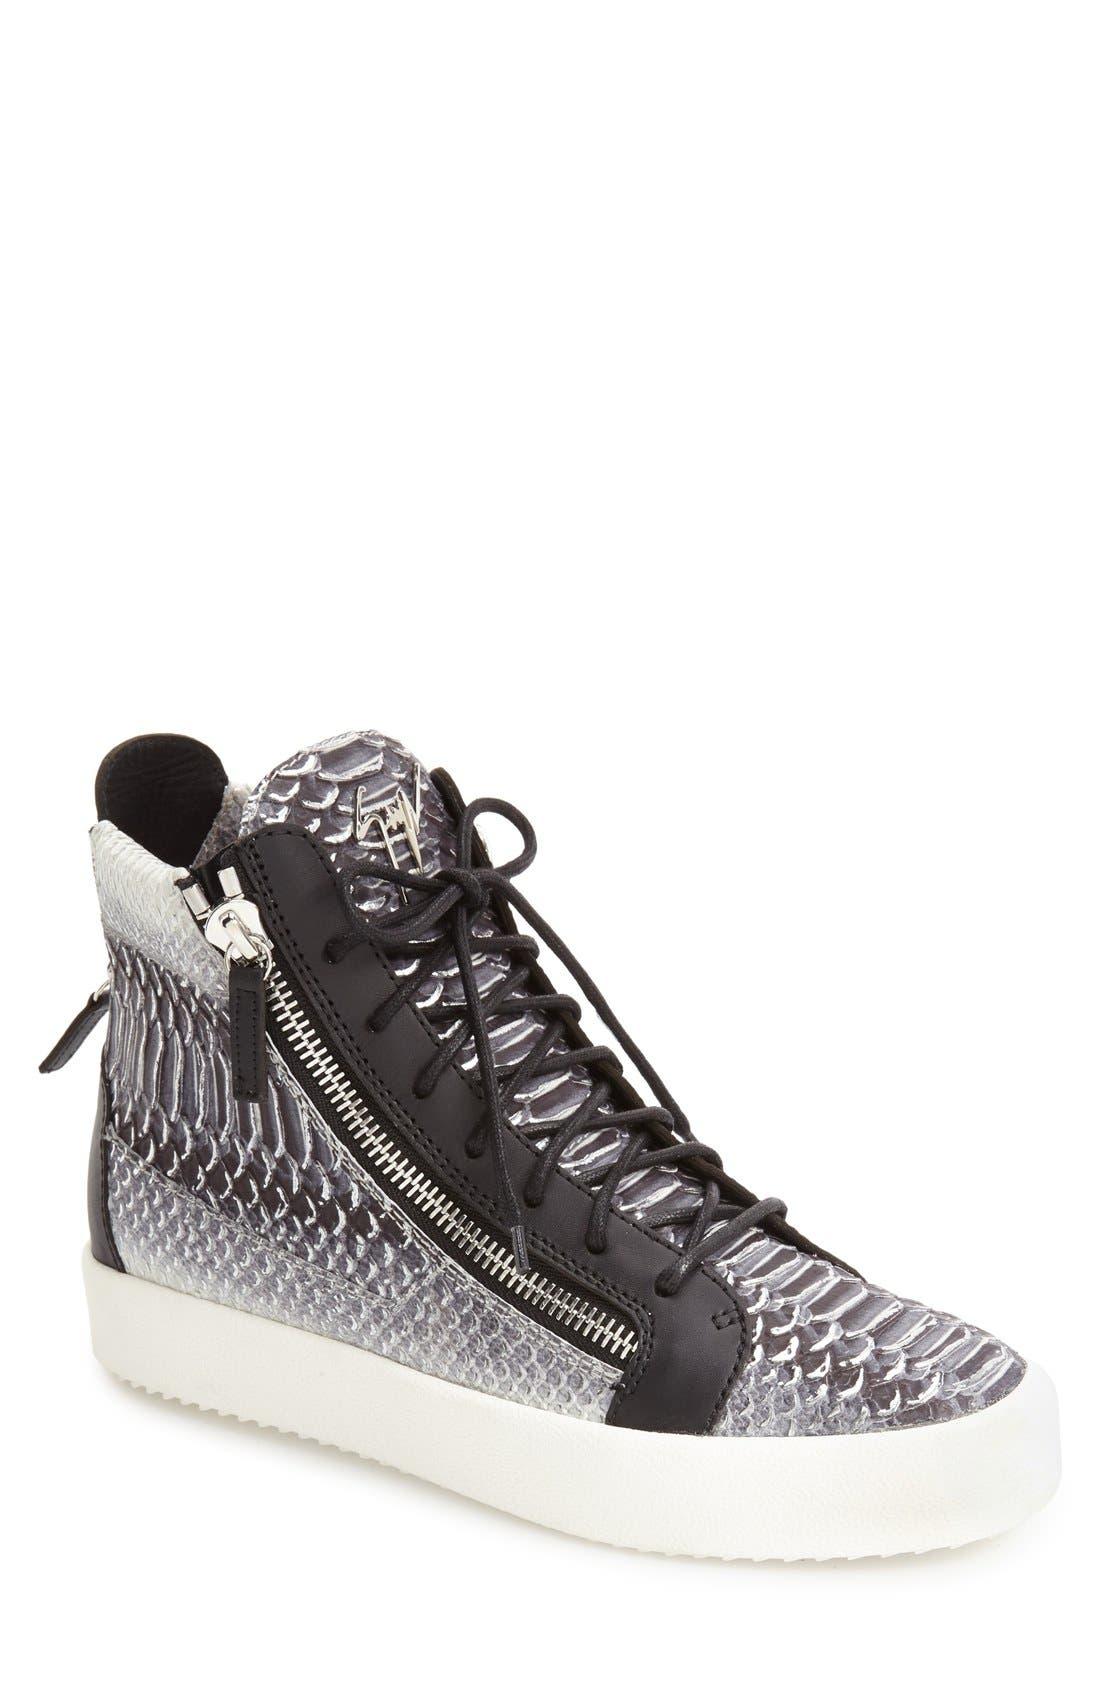 GIUSEPPE ZANOTTI Snake Print High Top Sneaker